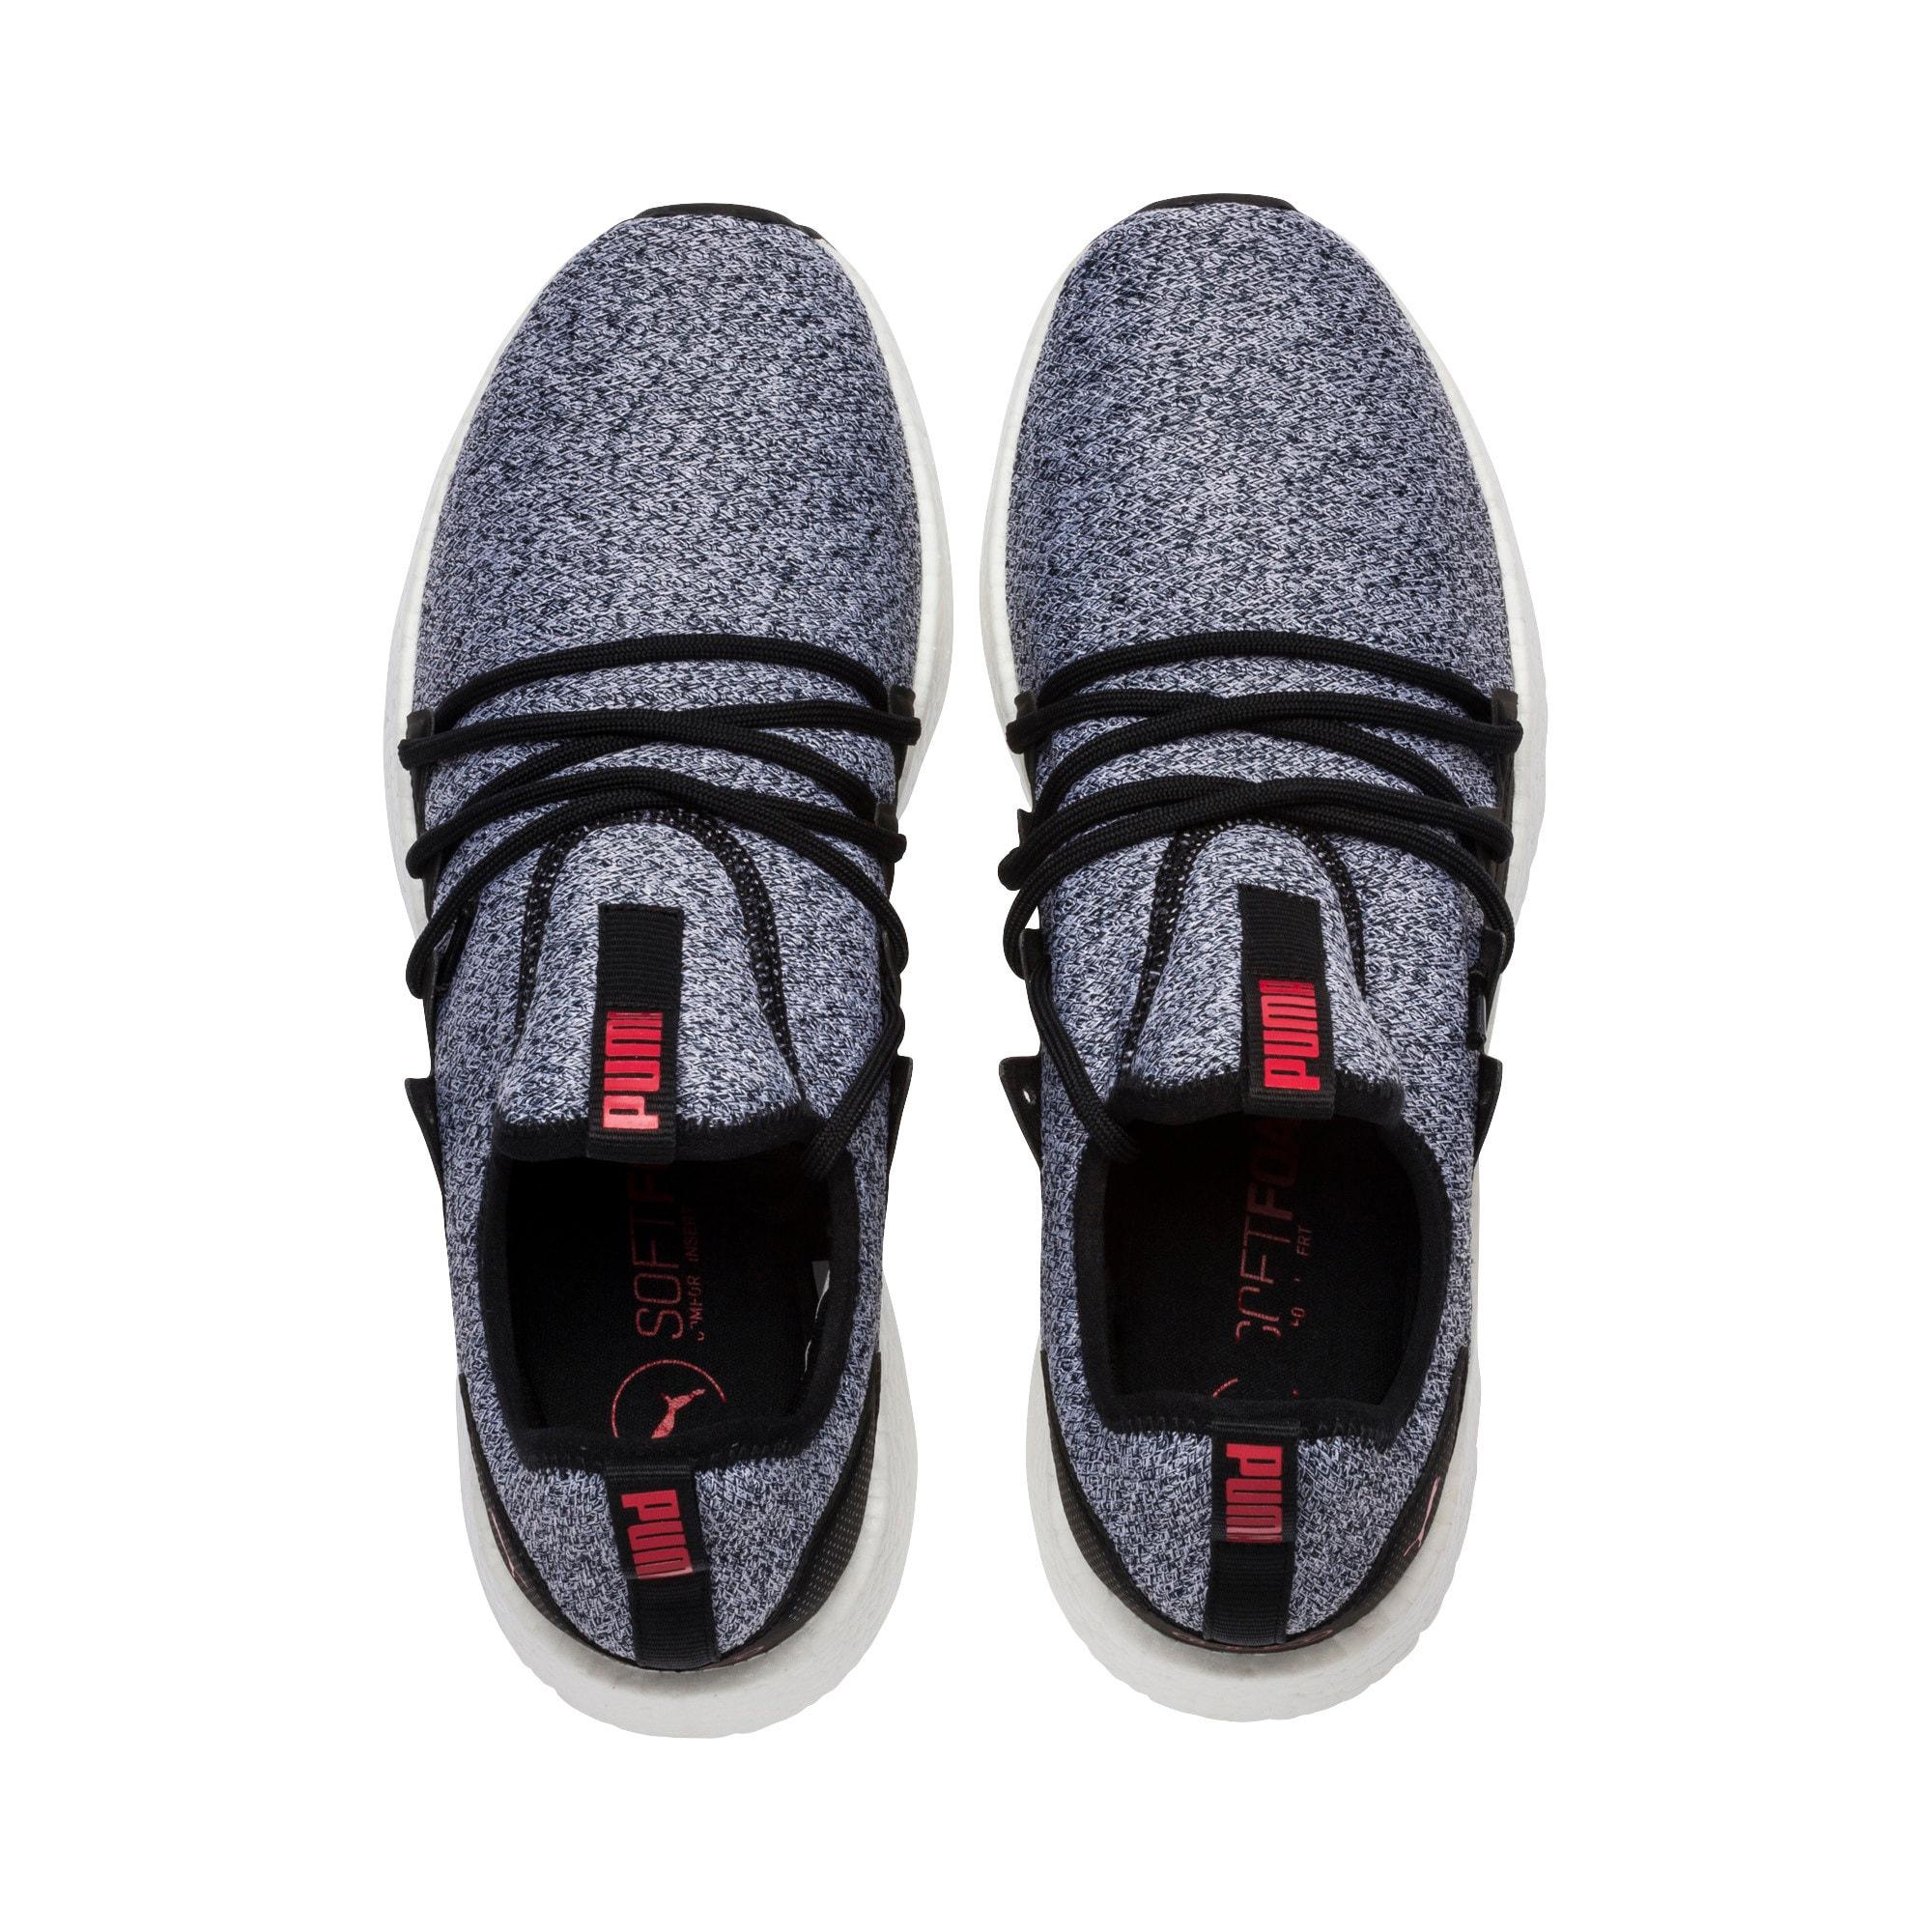 Thumbnail 6 of NRGY Neko Knit Men's Running Shoes, Puma Black-High Risk Red, medium